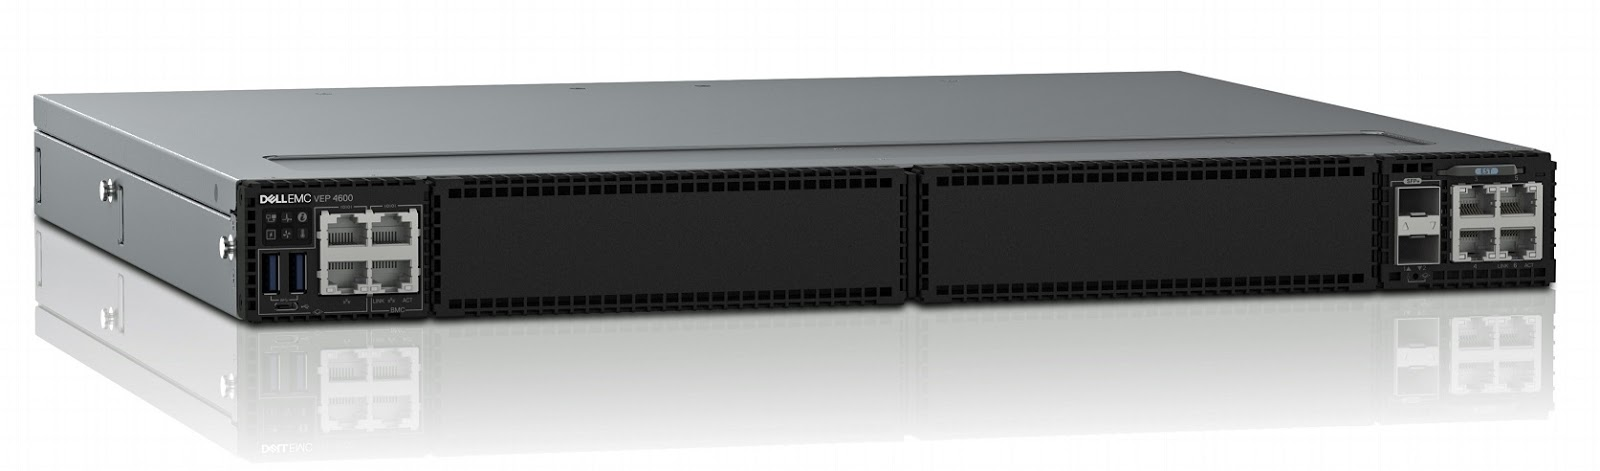 Dell EMC Jun 2019 Updates - the VEP, Digital Labs etc